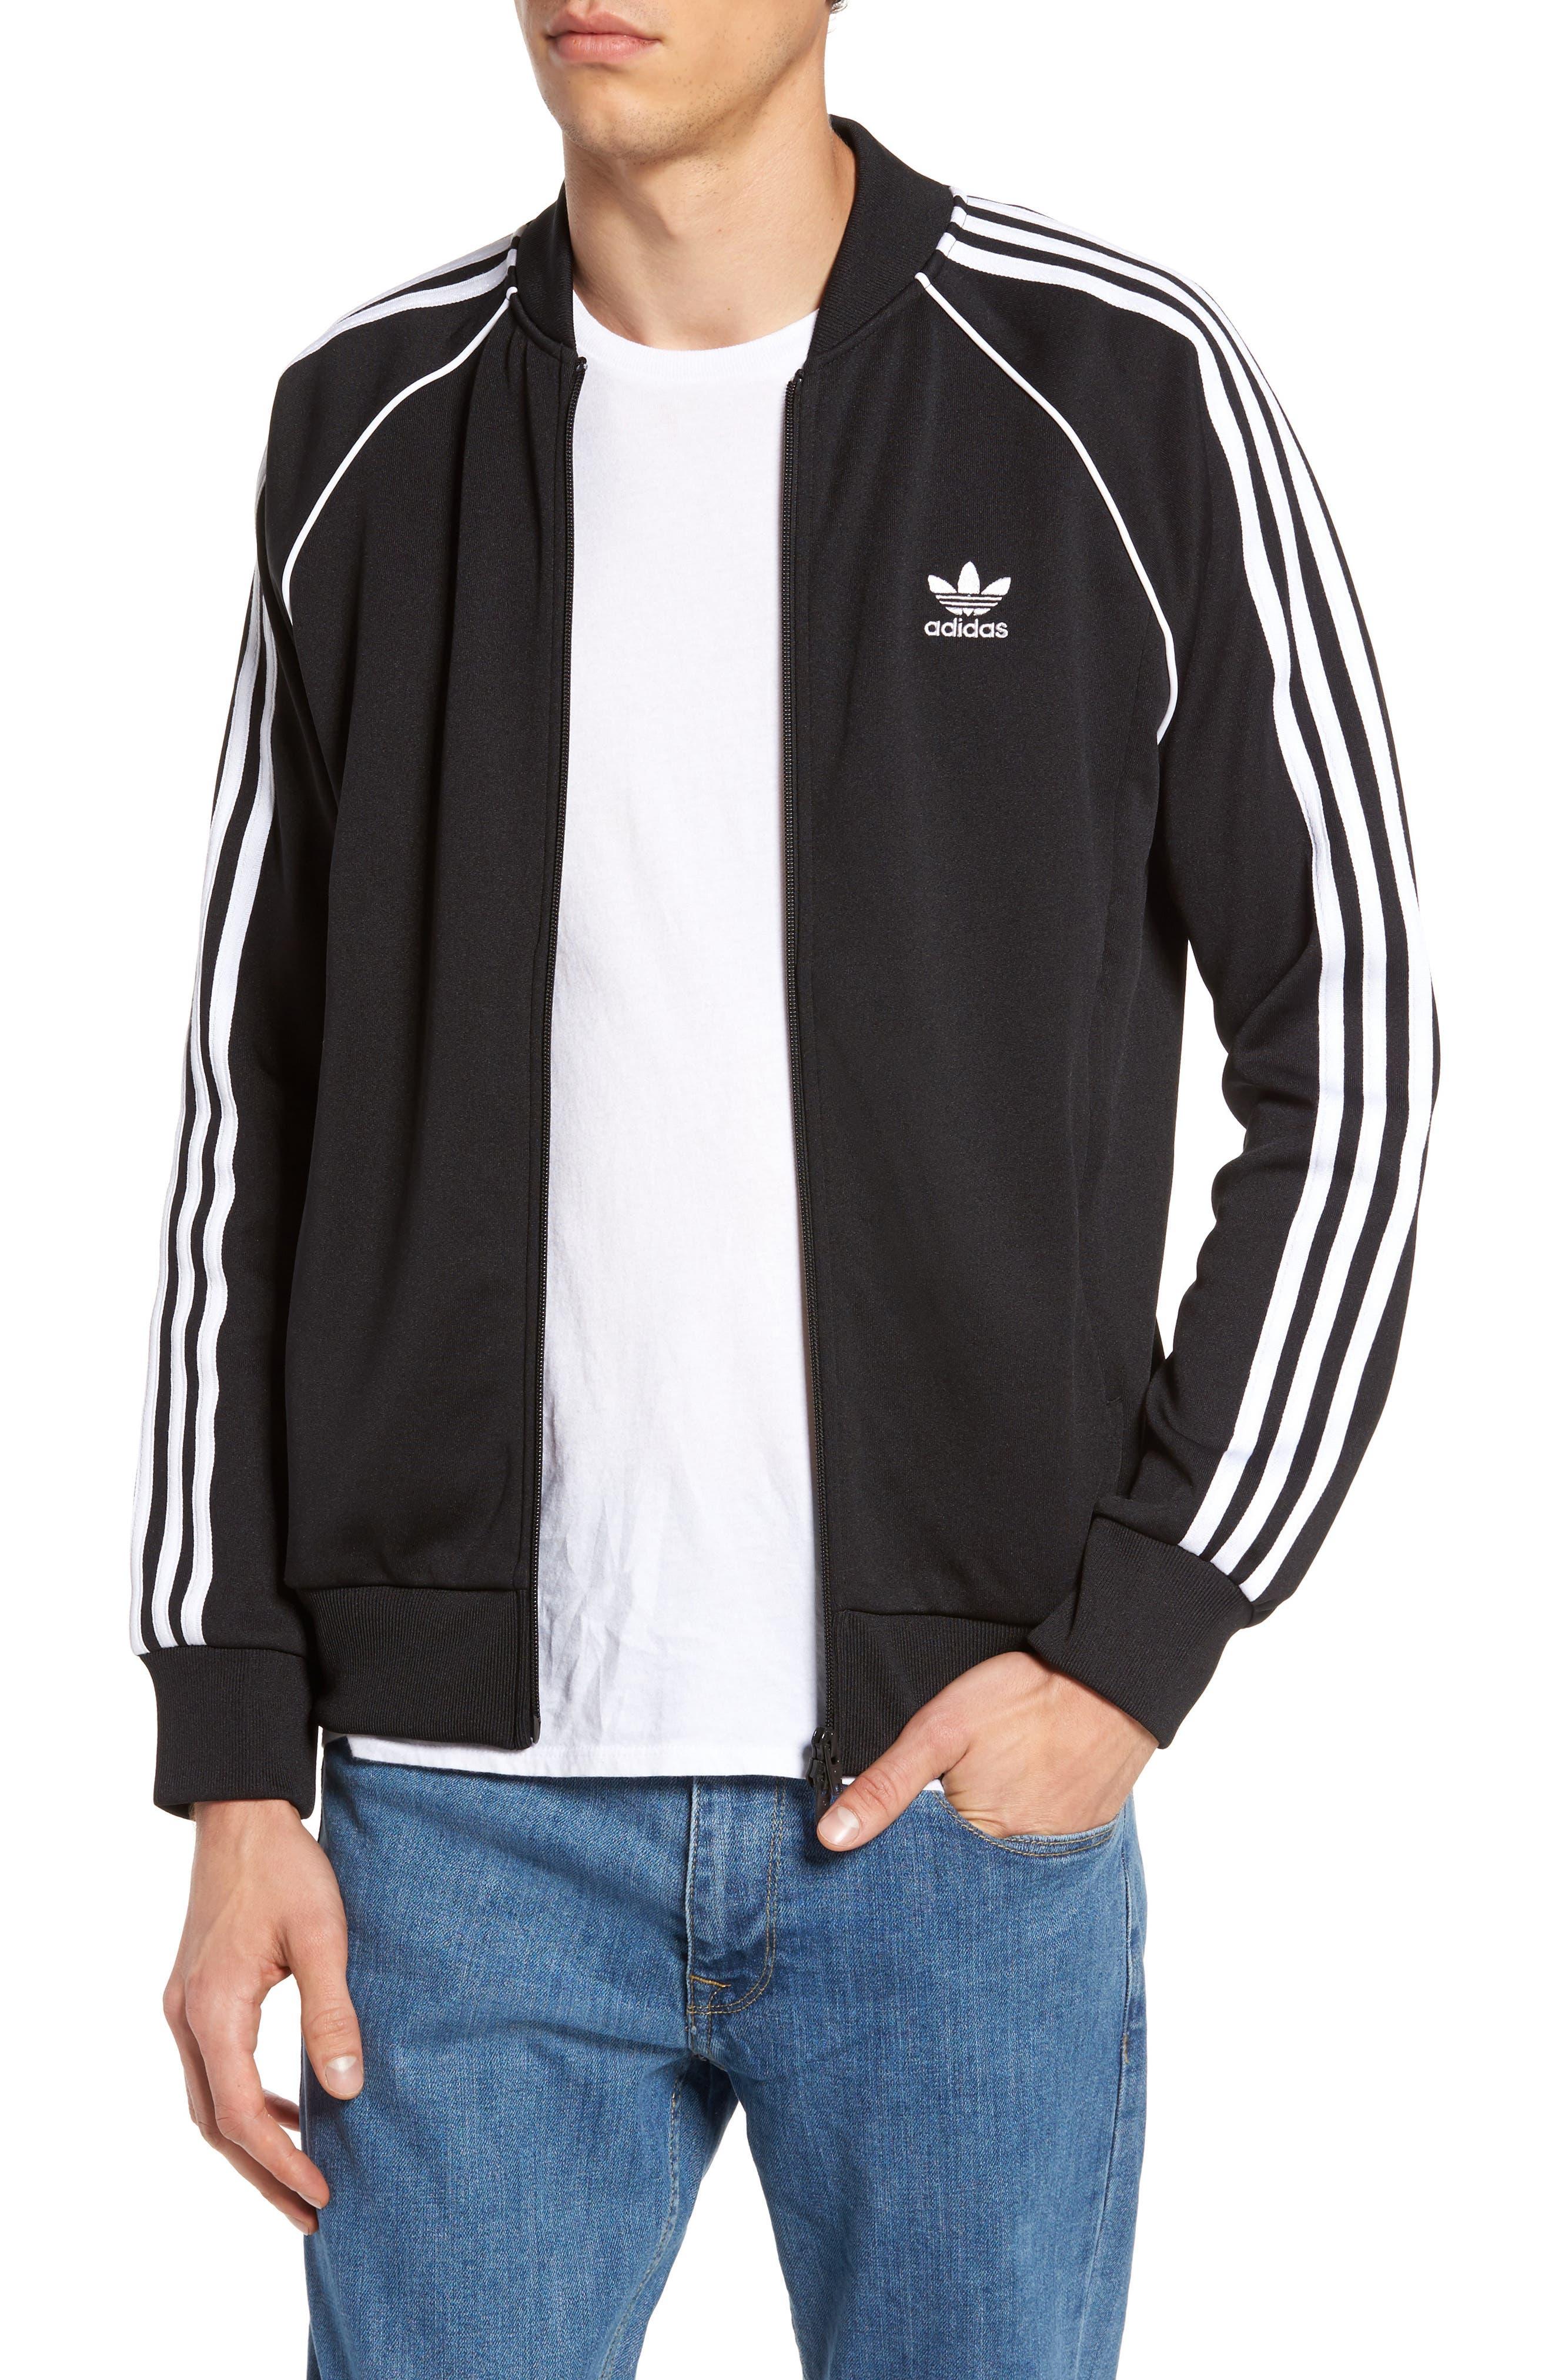 ADIDAS ORIGINALS SST Track Jacket, Main, color, BLACK